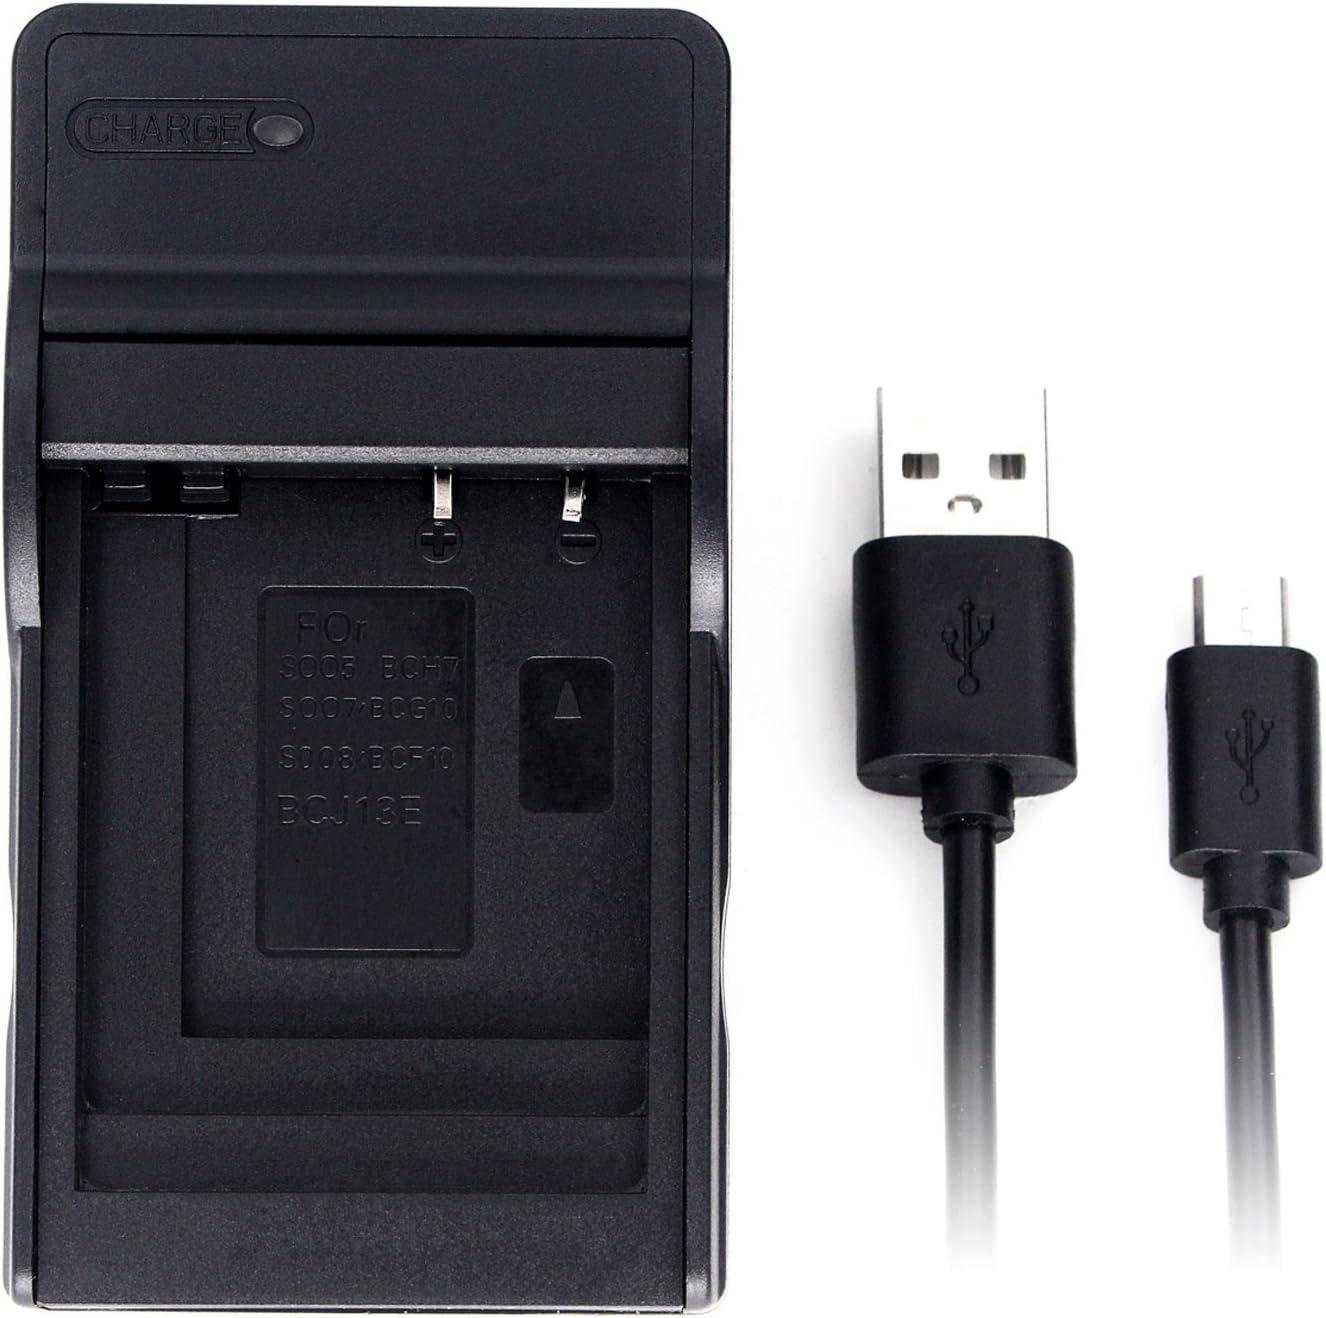 CGA-S005 USB Charger for Panasonic Lumix DMC-FS1 DMC-FS2 DMC-FX01 DMC-FX07 DMC-FX10 DMC-FX12 DMC-FX150 DMC-FX180 DMC-FX3 DMC-FX50 DMC-FX8 DMC-FX9 DMC-LX1 DMC-LX2 DMC-LX3 and More